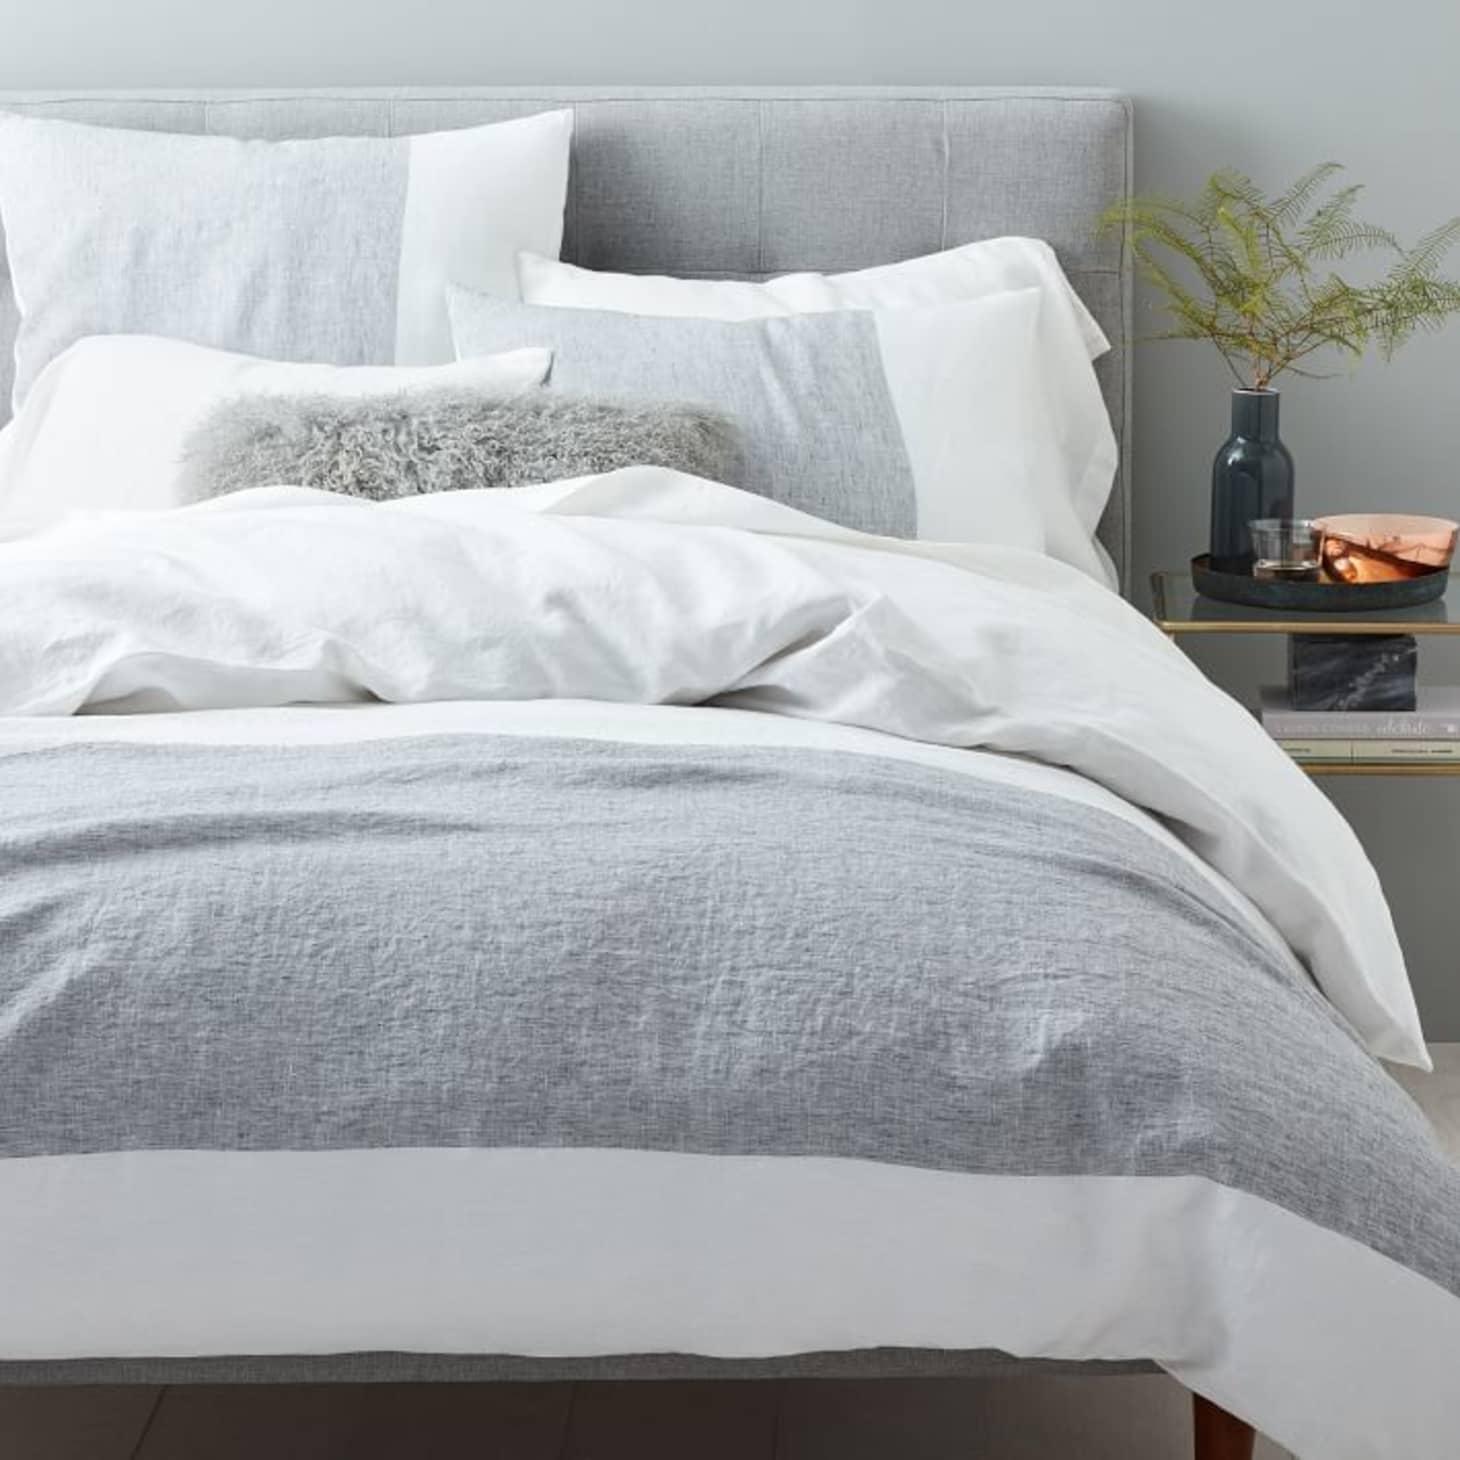 Terrific The Best Duvet Covers Linen Cotton Flannel Apartment Pdpeps Interior Chair Design Pdpepsorg